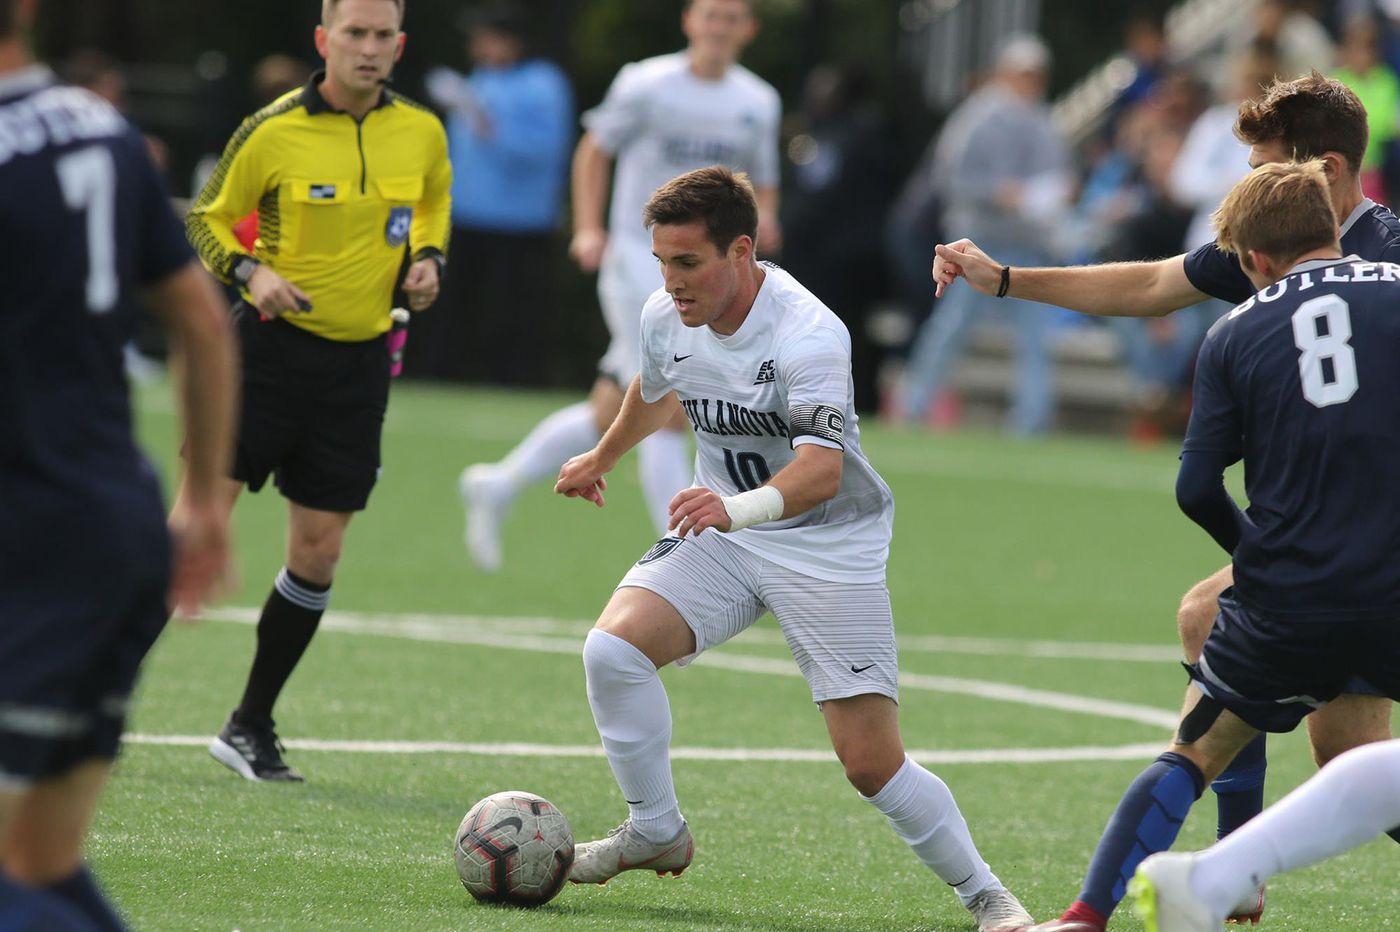 Villanova midfielder Zach Zandi signs with Bethlehem Steel